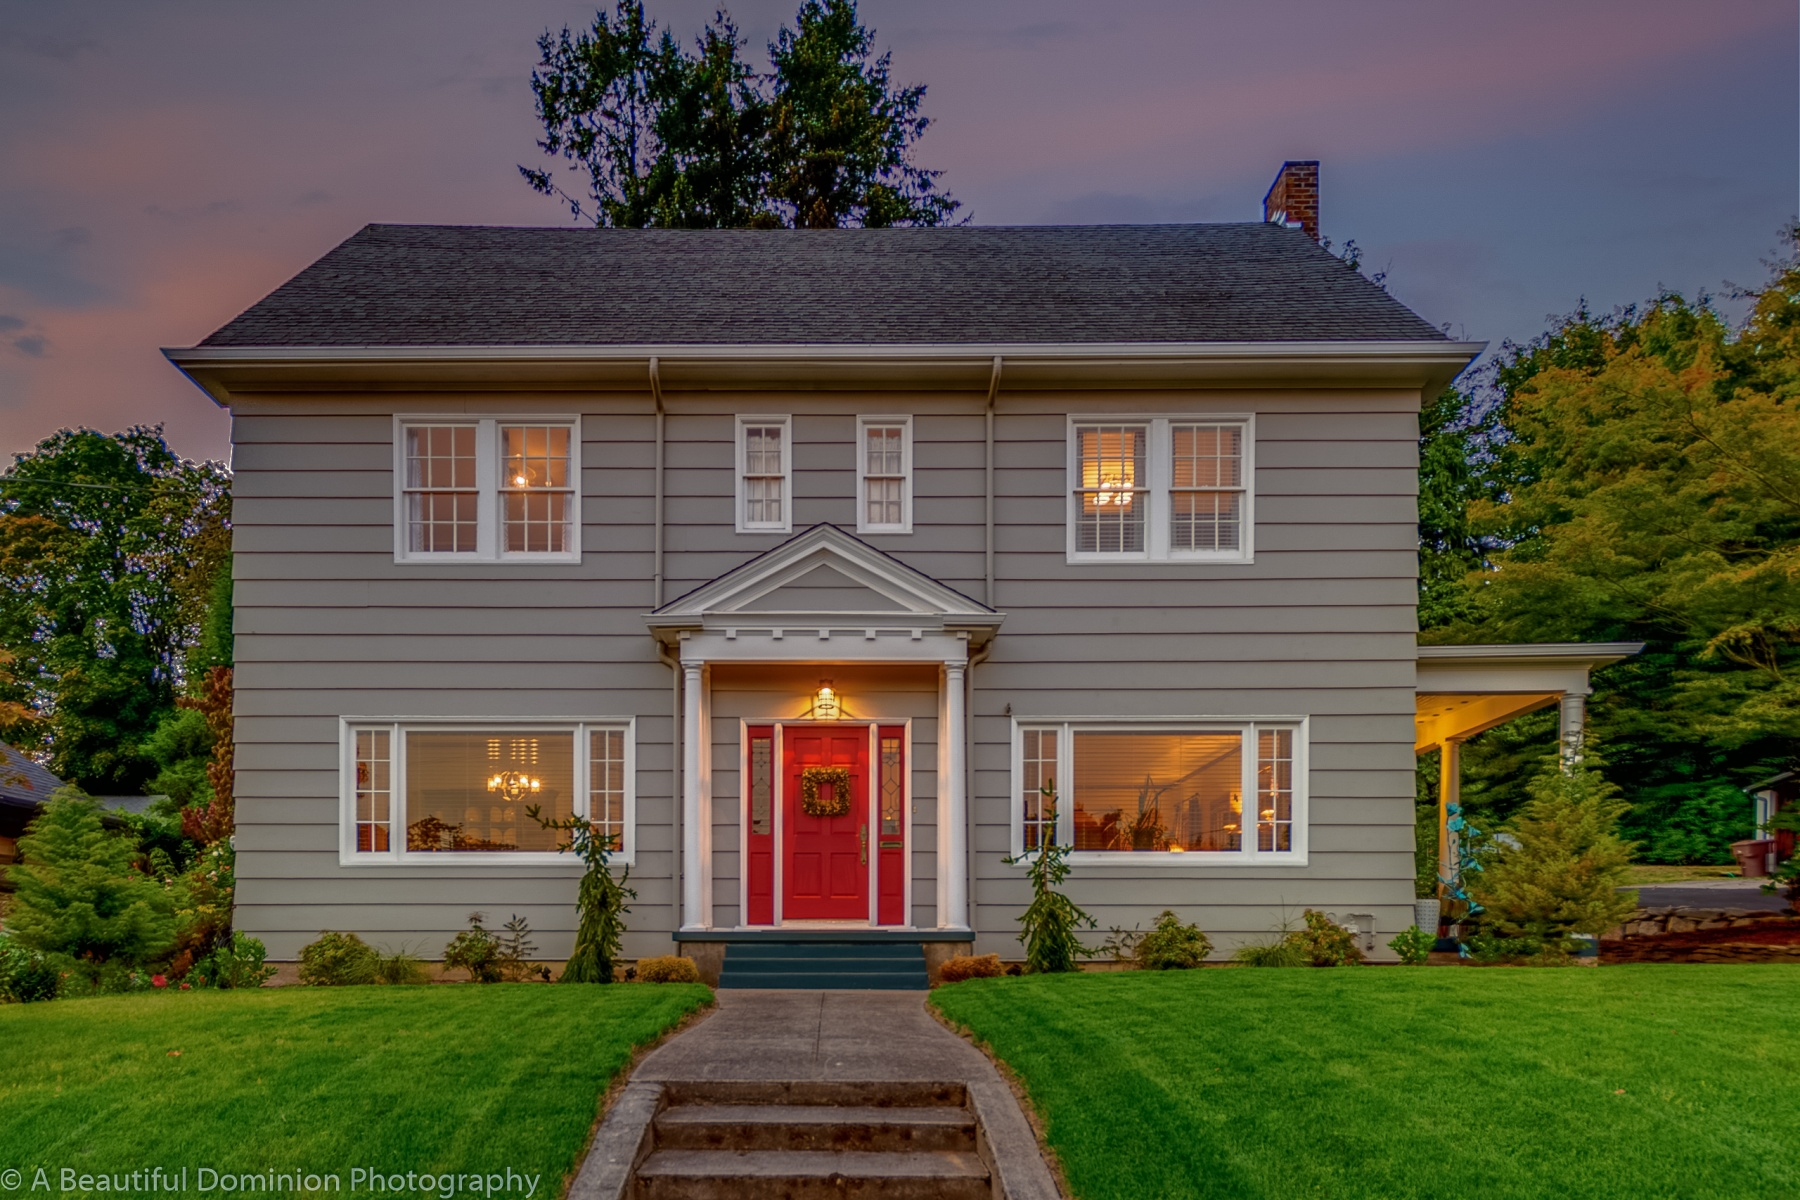 Single Family Home for Sale at Historical Camas Colonial 935 NE 6TH Ave Camas, Washington 98607 United States